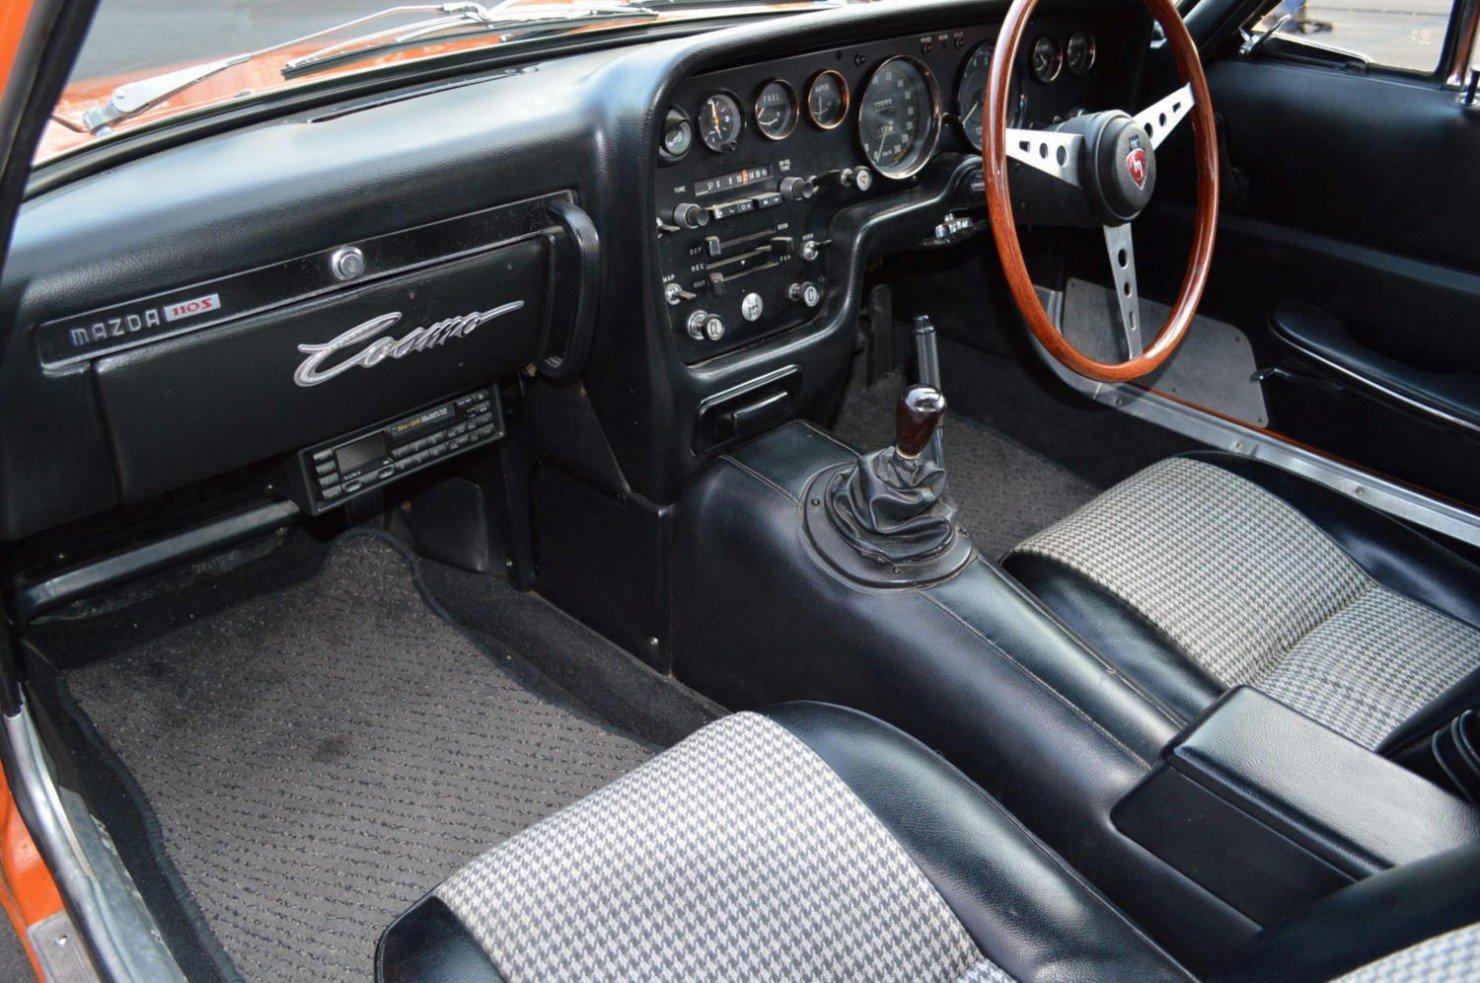 Mazda-Cosmo-Car-12